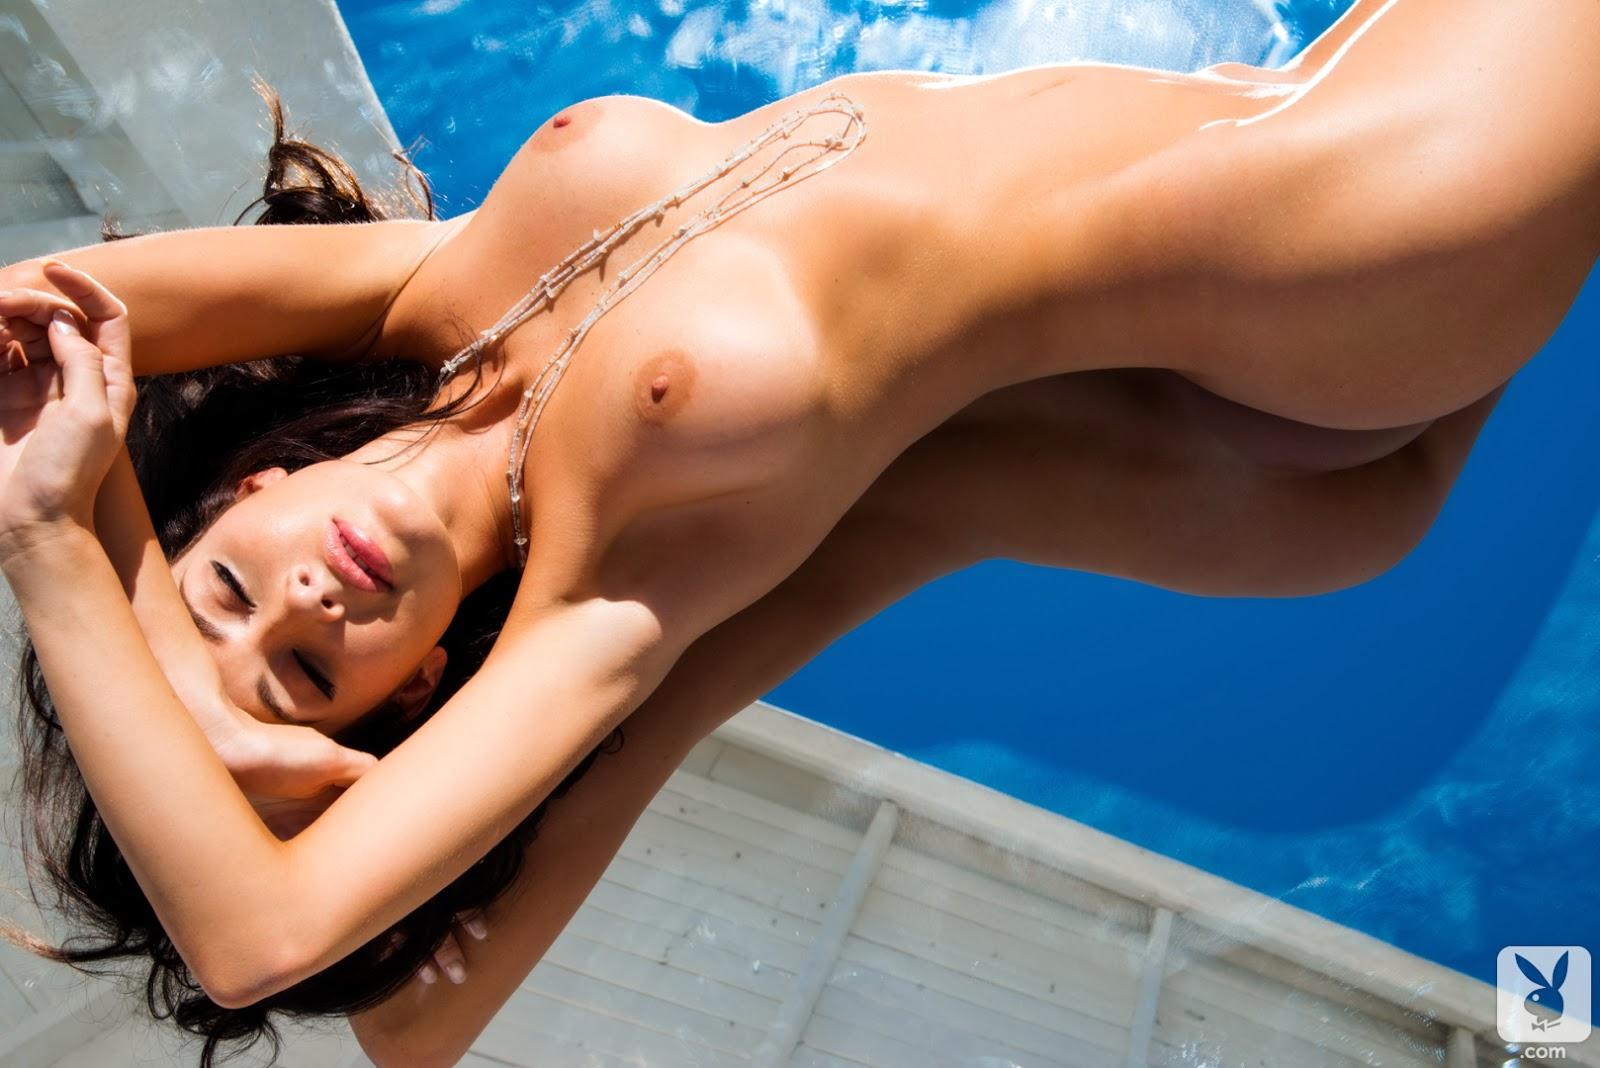 Gemma Lee Farrell Nude Ele gemma lee farrell | sexy sports